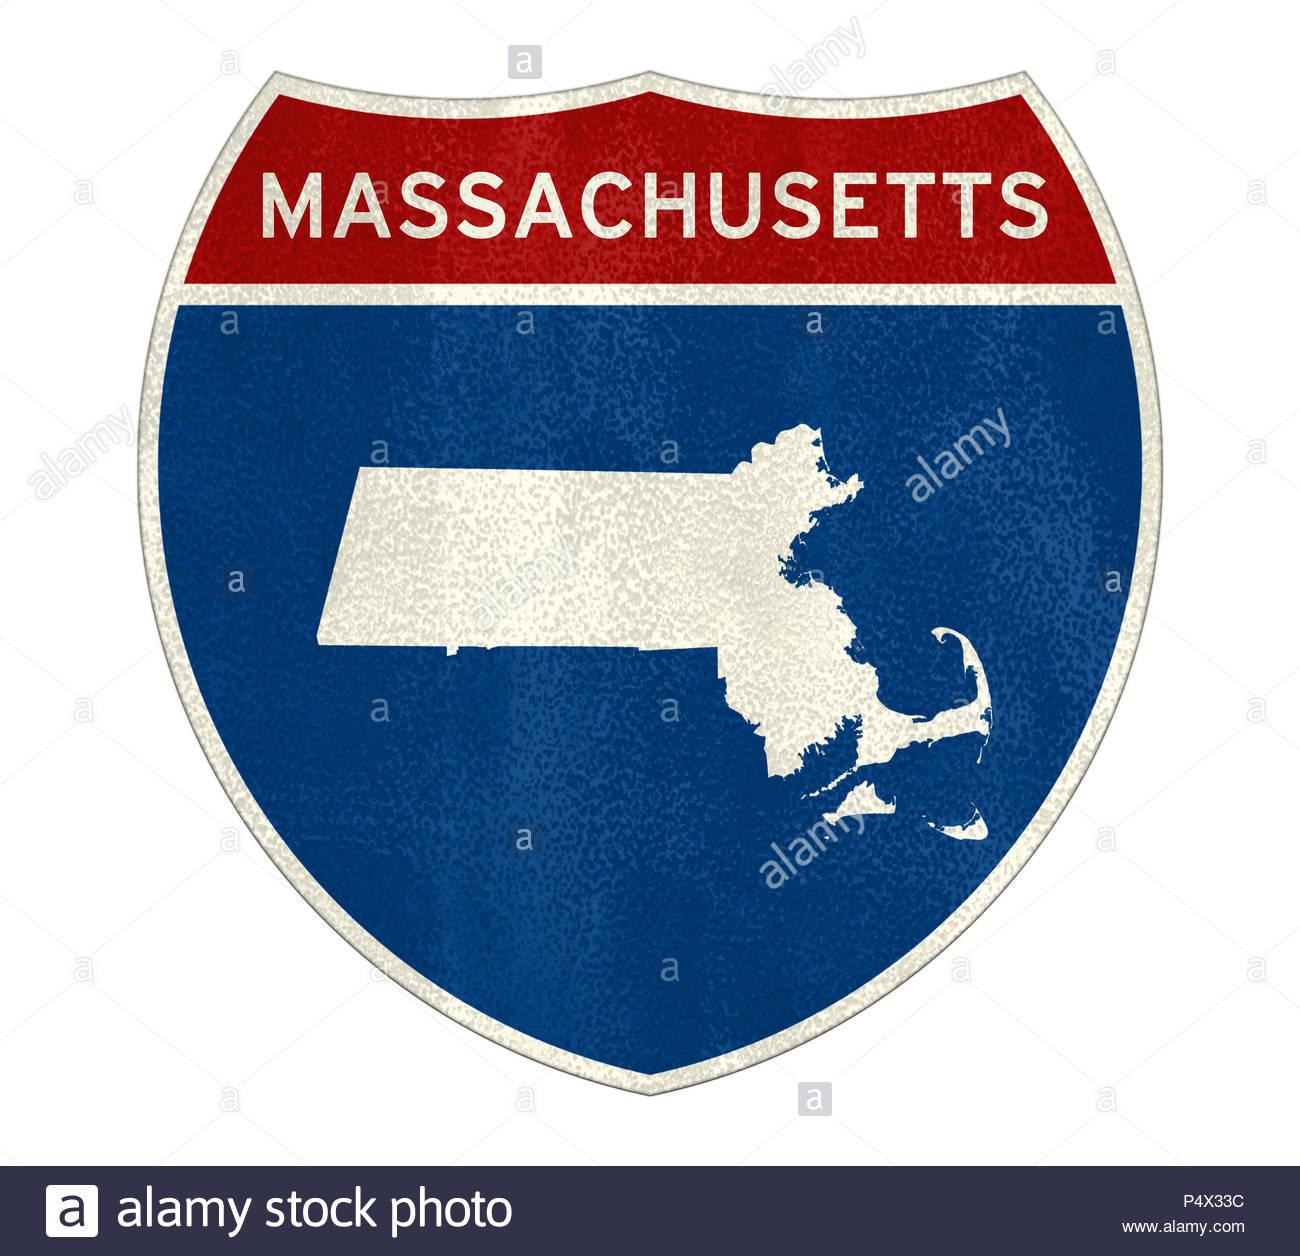 Massachusetts State Interstate road sign - Stock Image